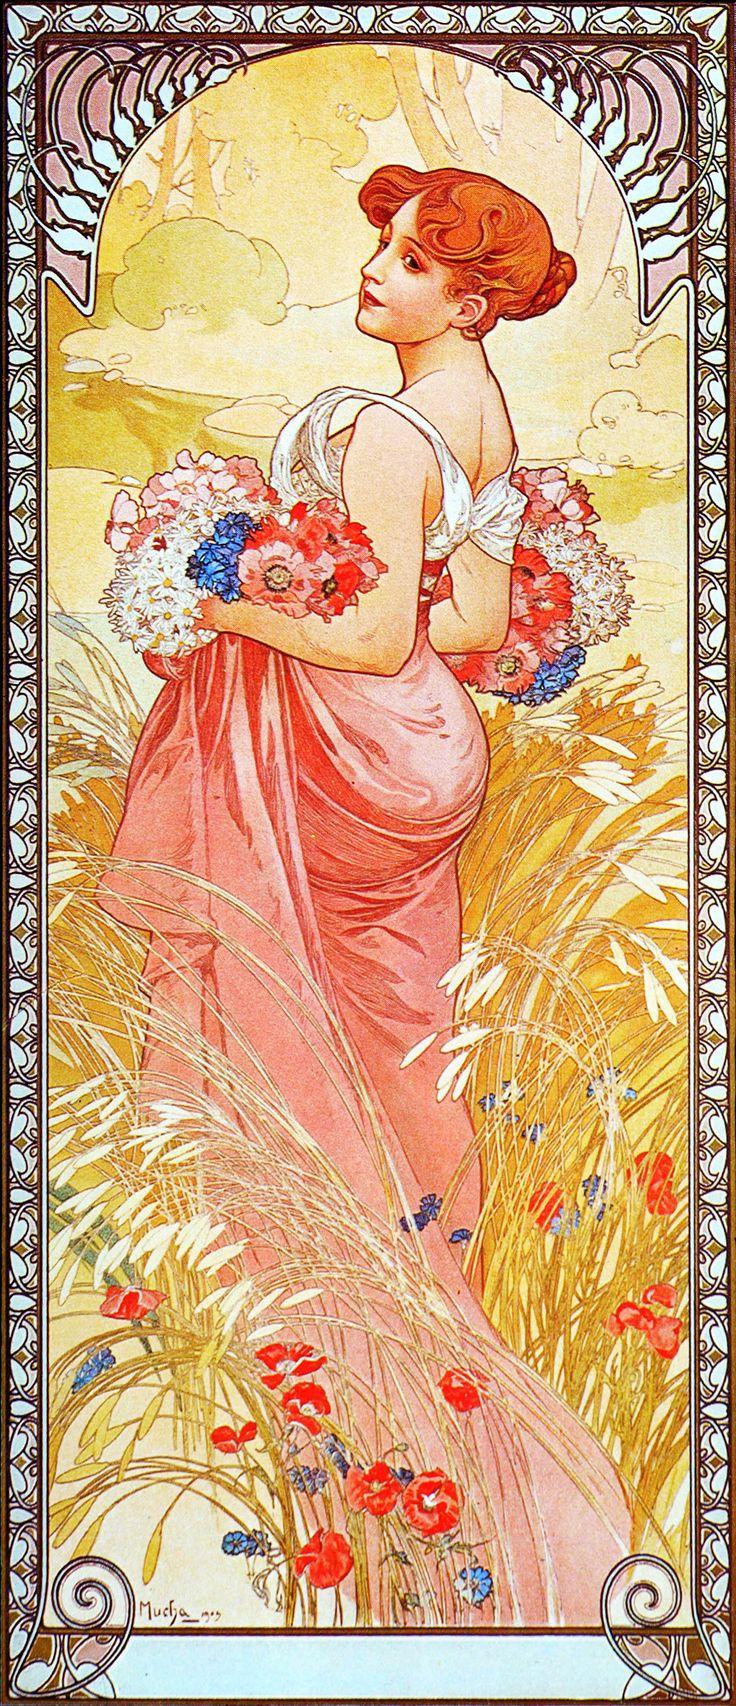 alphonse mucha art nouveau essay Lot essay  although widely regarded as one of the premier artists of the art nouveau period, mucha shared much in philosophy  alphonse mucha , rusaldla.